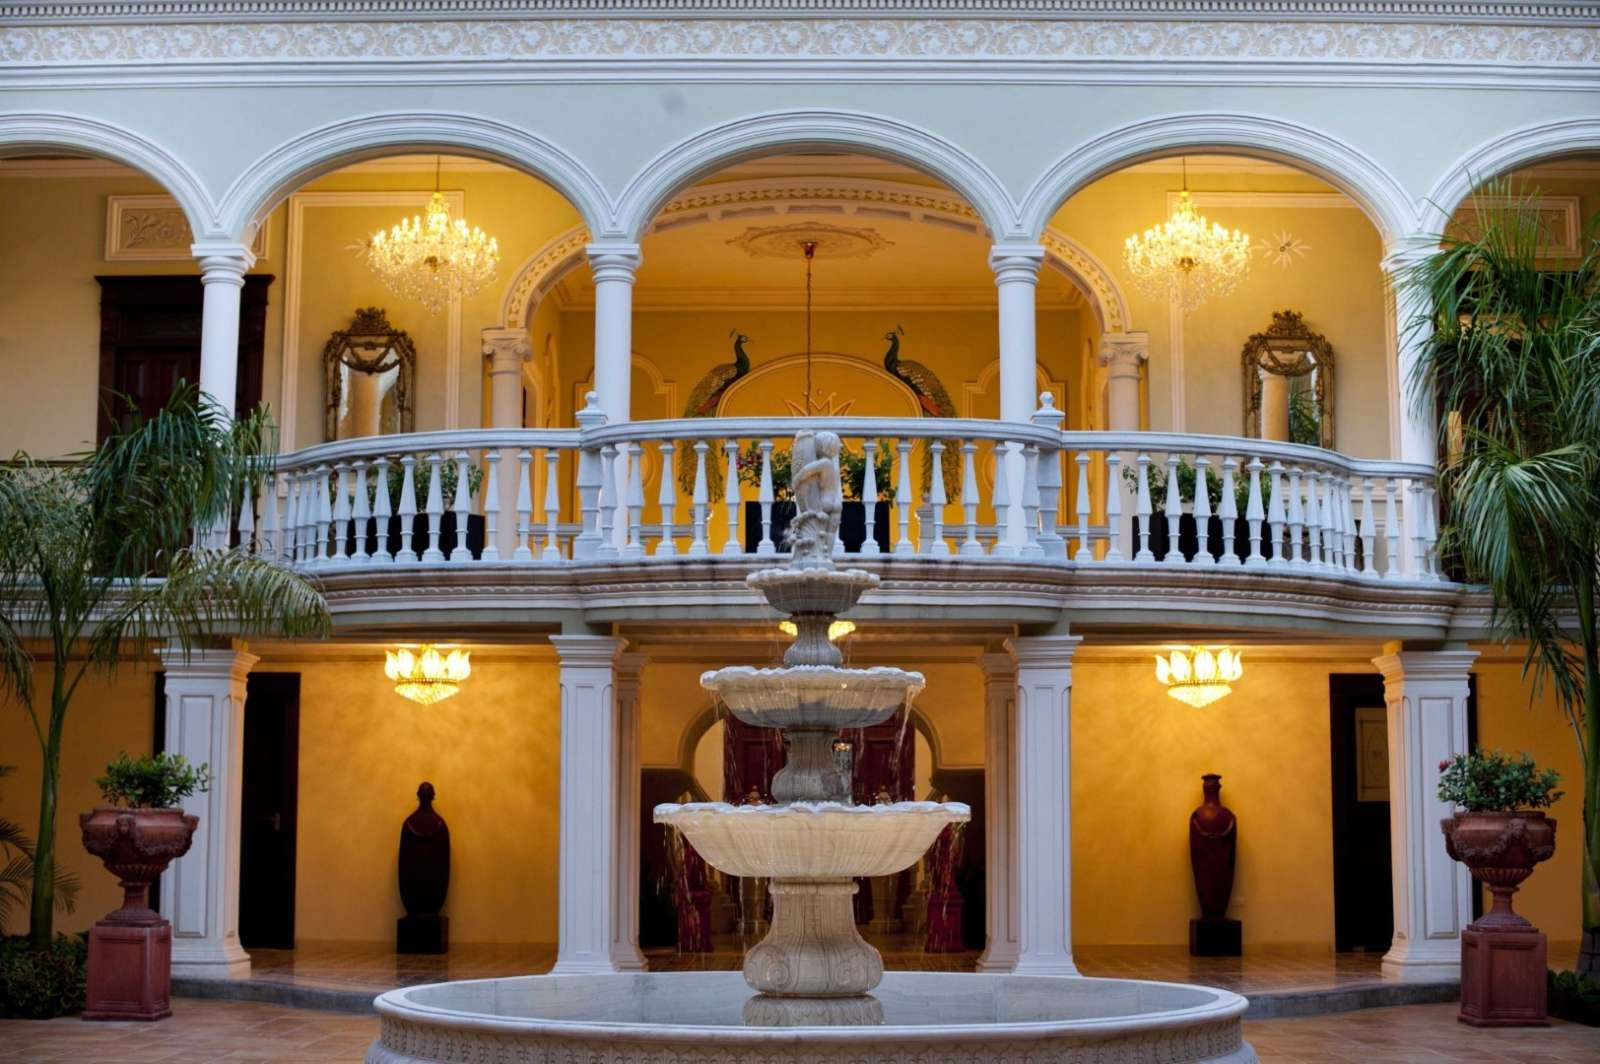 Courtyard at hotel Mansion Merida